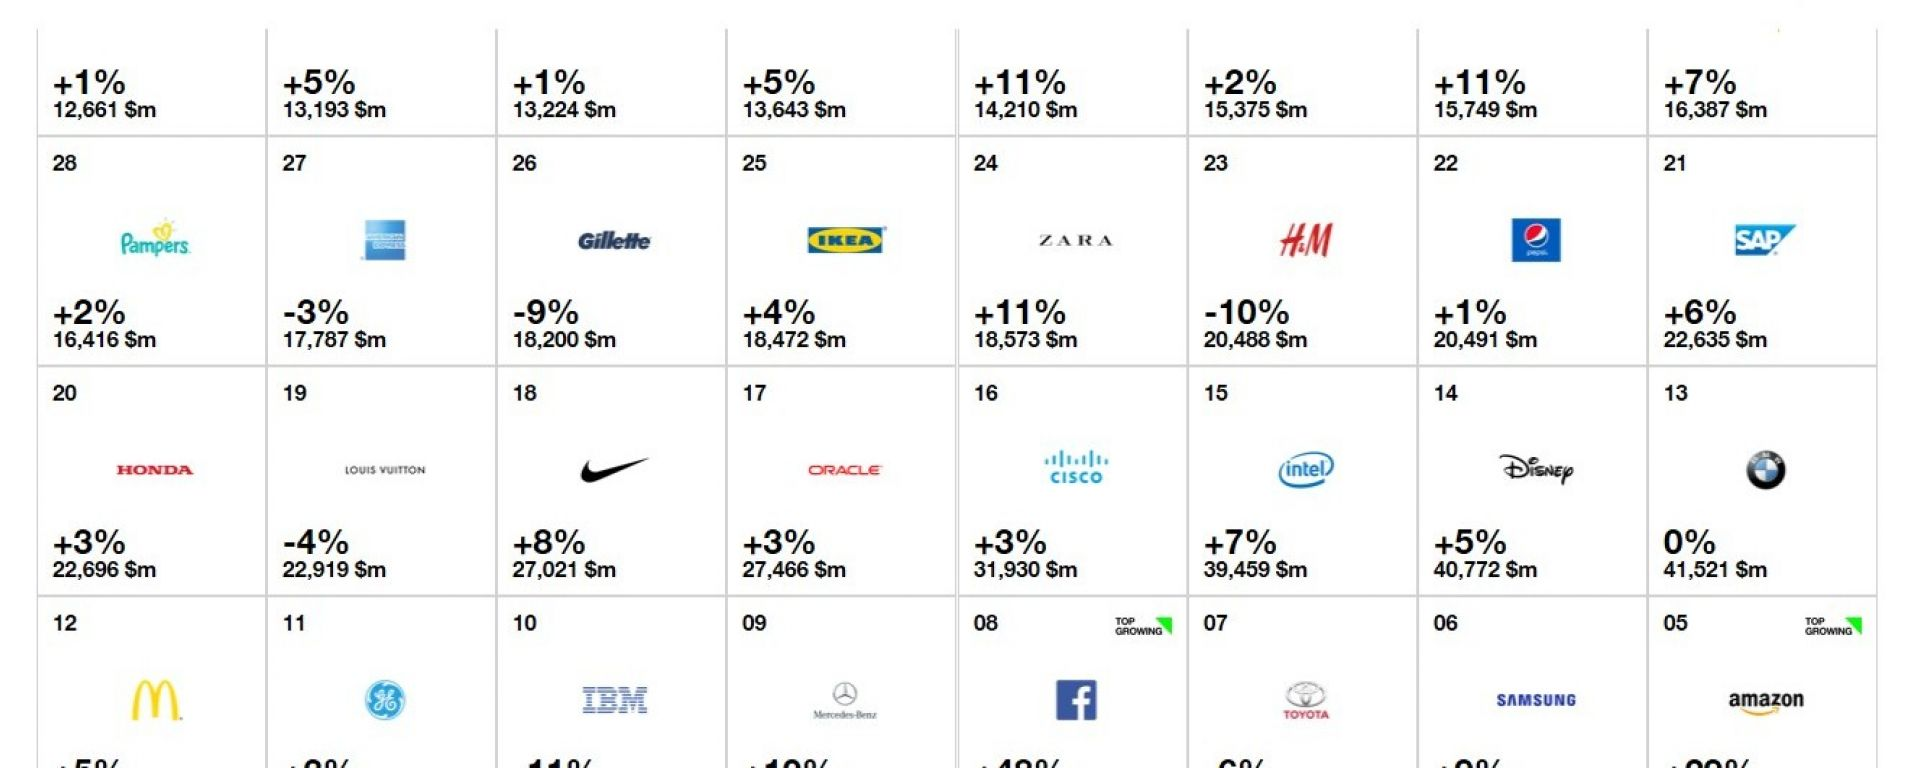 Interbrand: Best Global Brands 2017 | Ranking